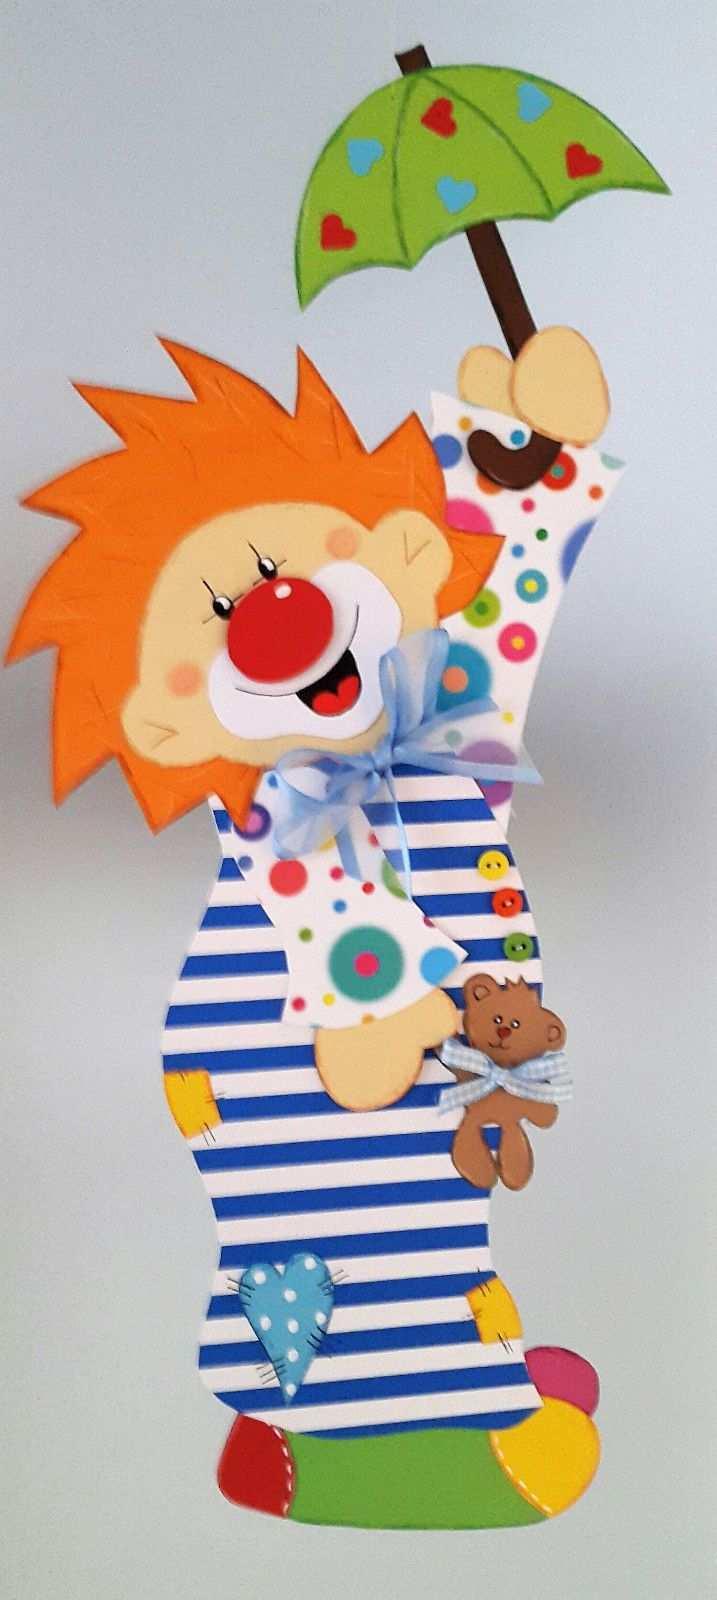 Fensterbild Clown Im Nachthemd Fasching Karneval Dekoration Tonkarton In Bastel K Karneval Basteln Dekoration Karneval Basteln Kindern Clown Basteln